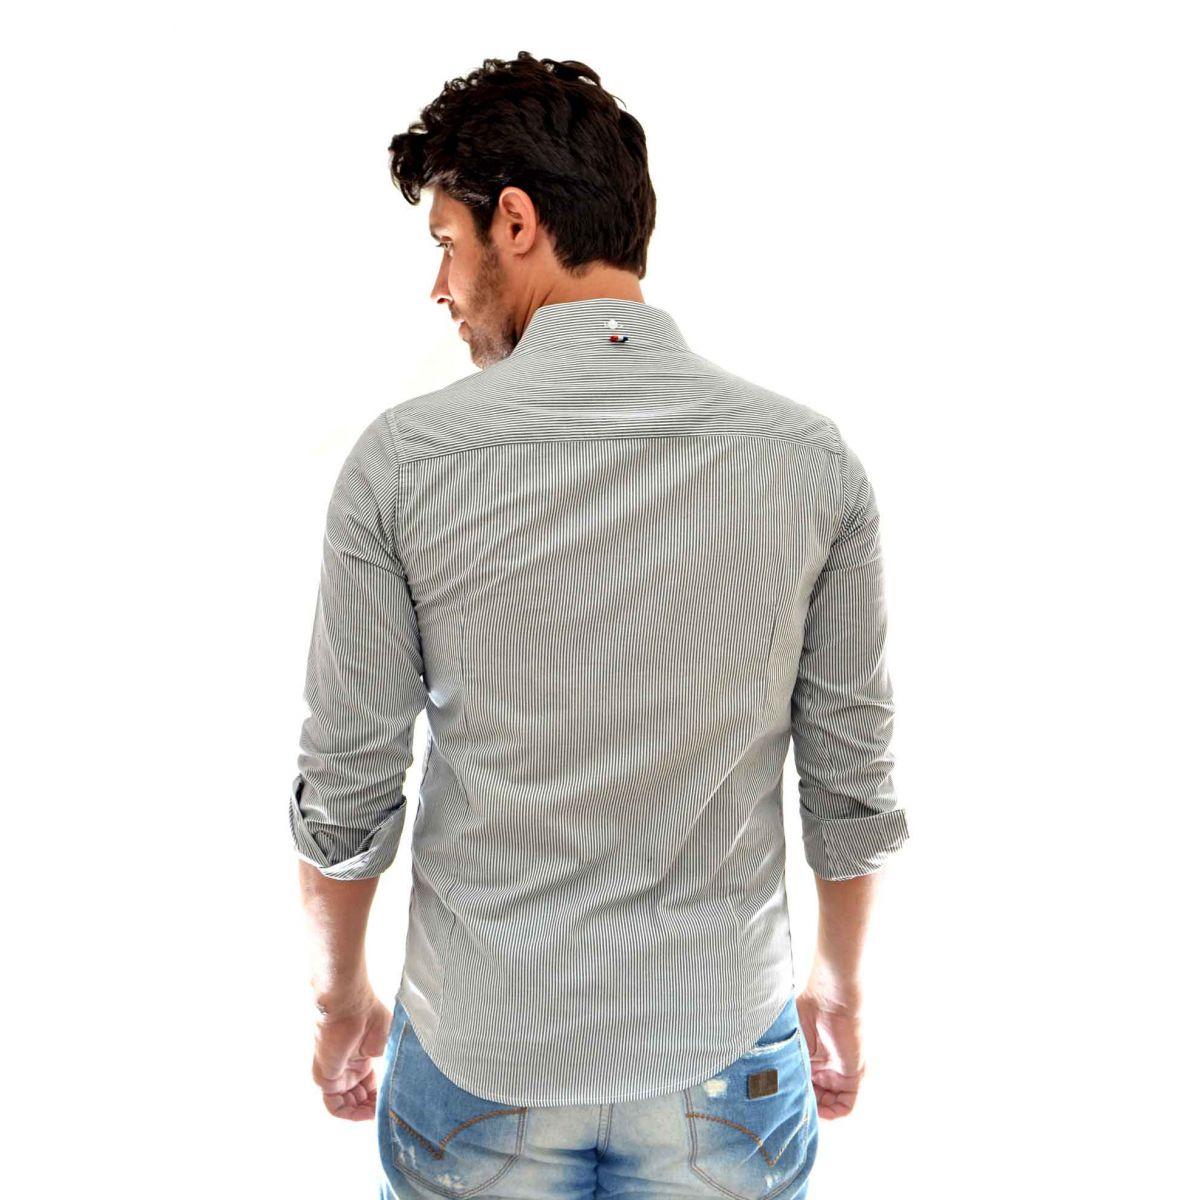 Camisa Social SK Listrada Cinza   - Ca Brasileira